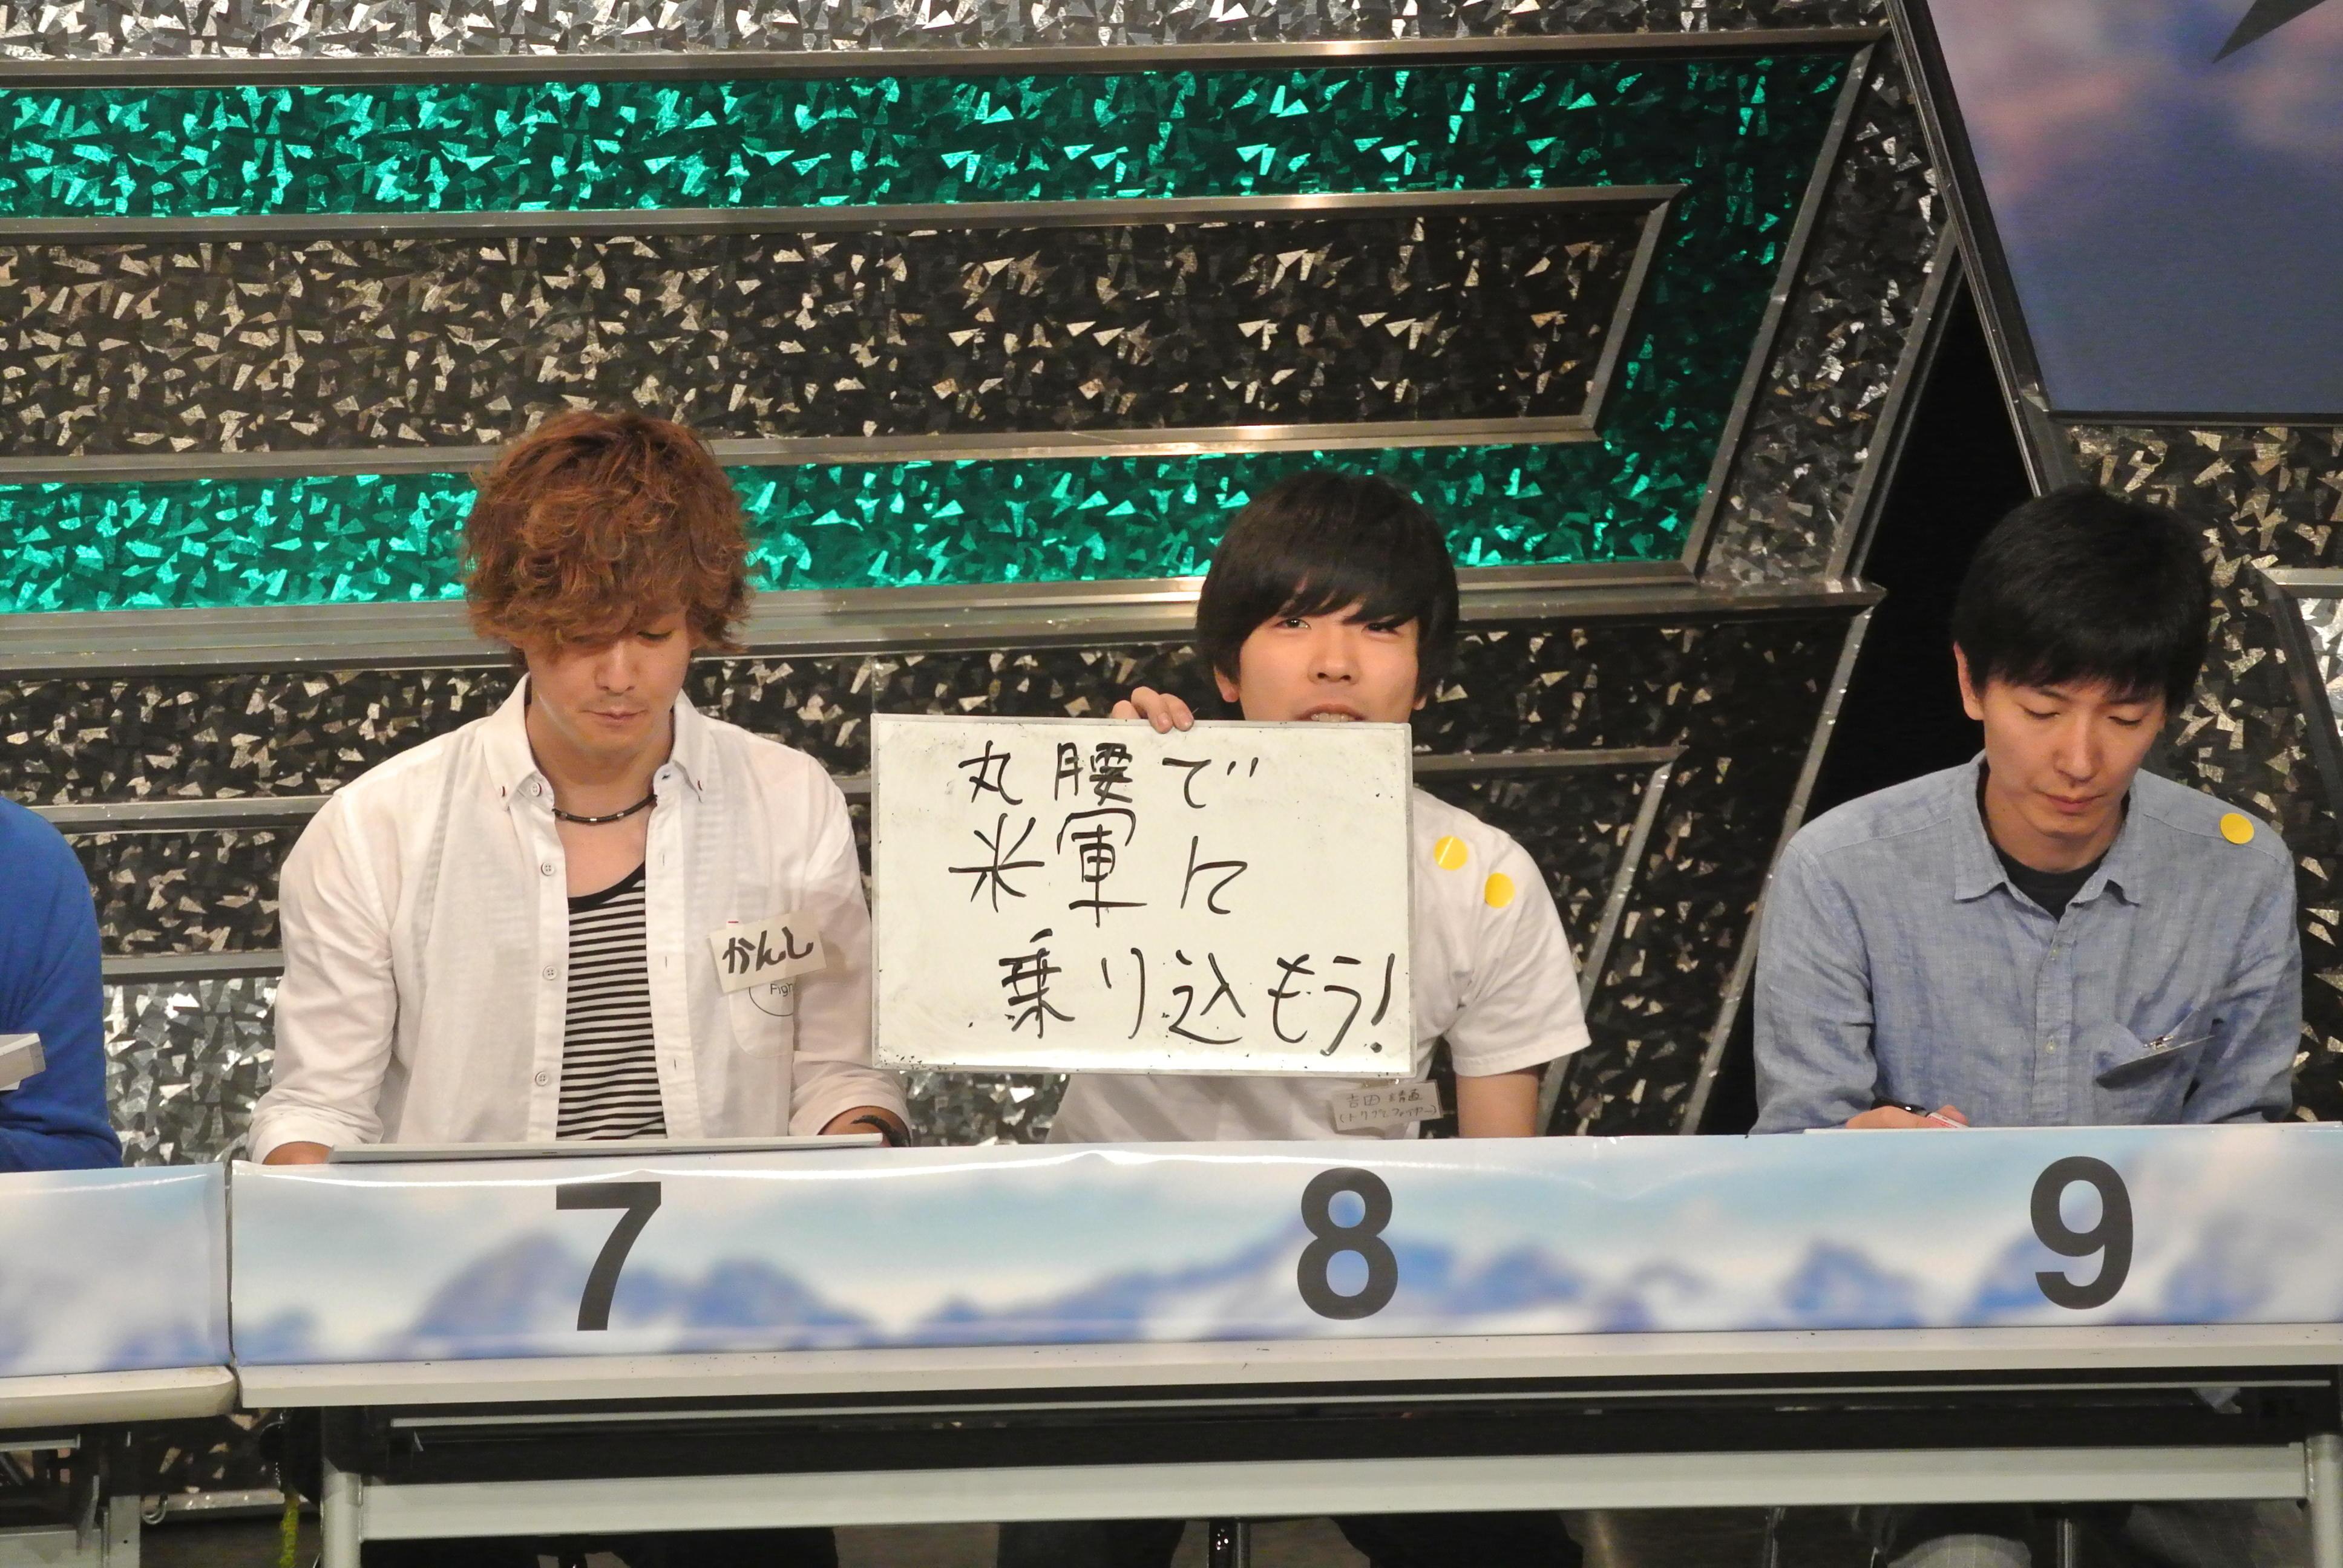 http://news.yoshimoto.co.jp/20160628220141-d73729faa0b277020243aa44dc149fda878ef203.jpg